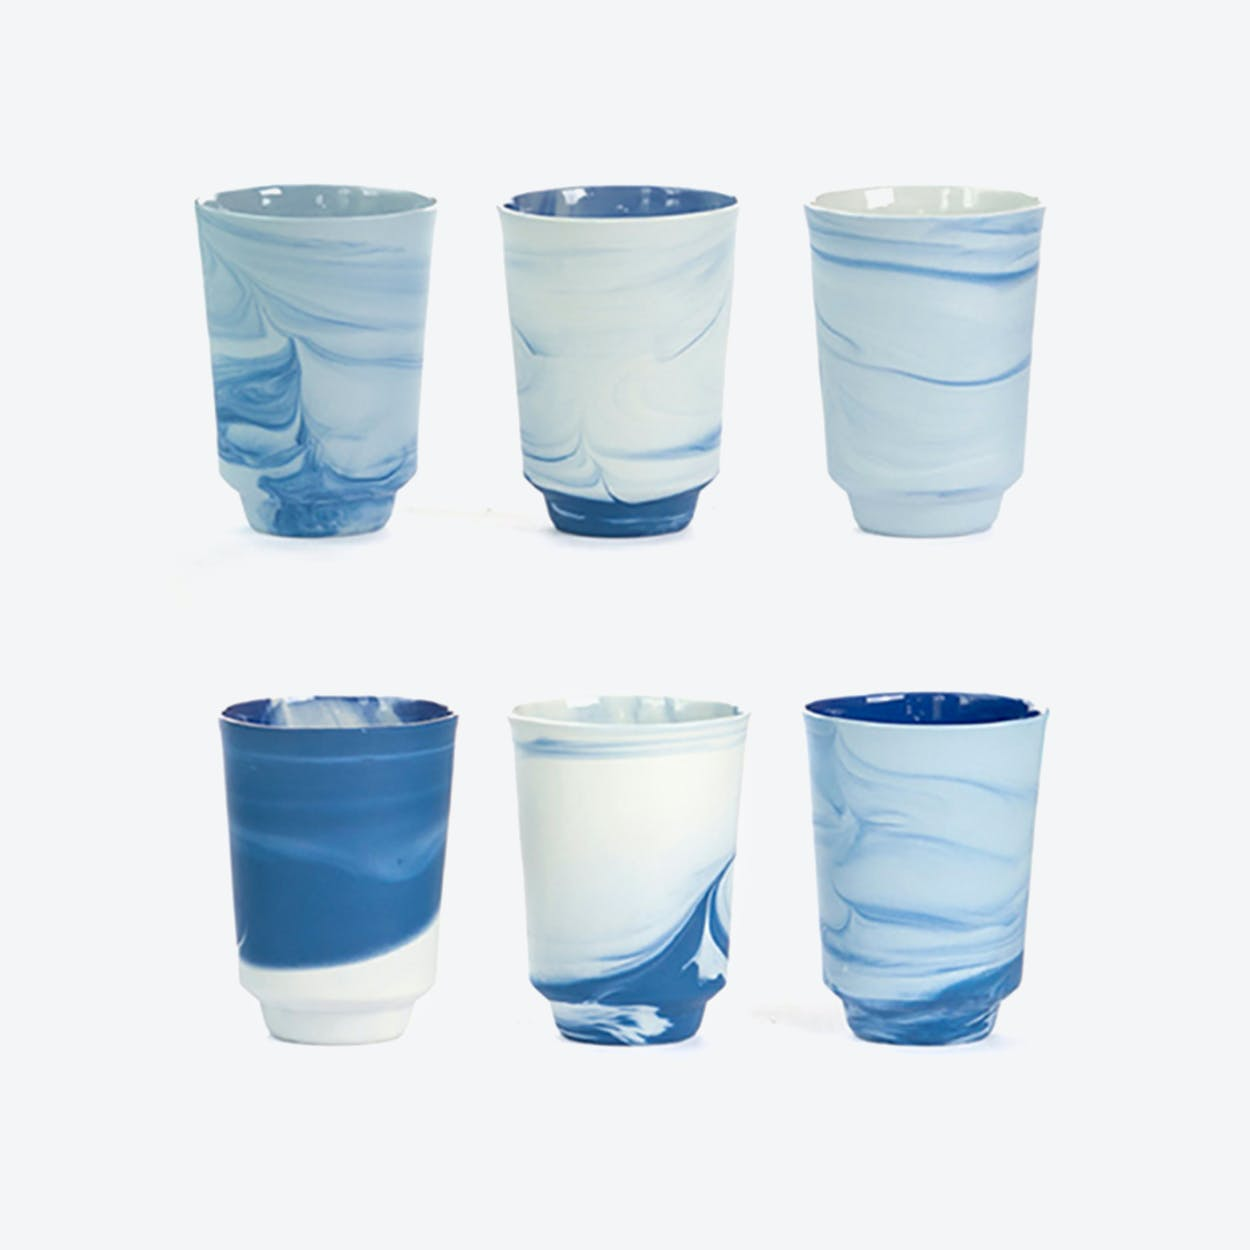 Pigments & Porcelain Tea Cups in Blue (set of 6x, 300ml)